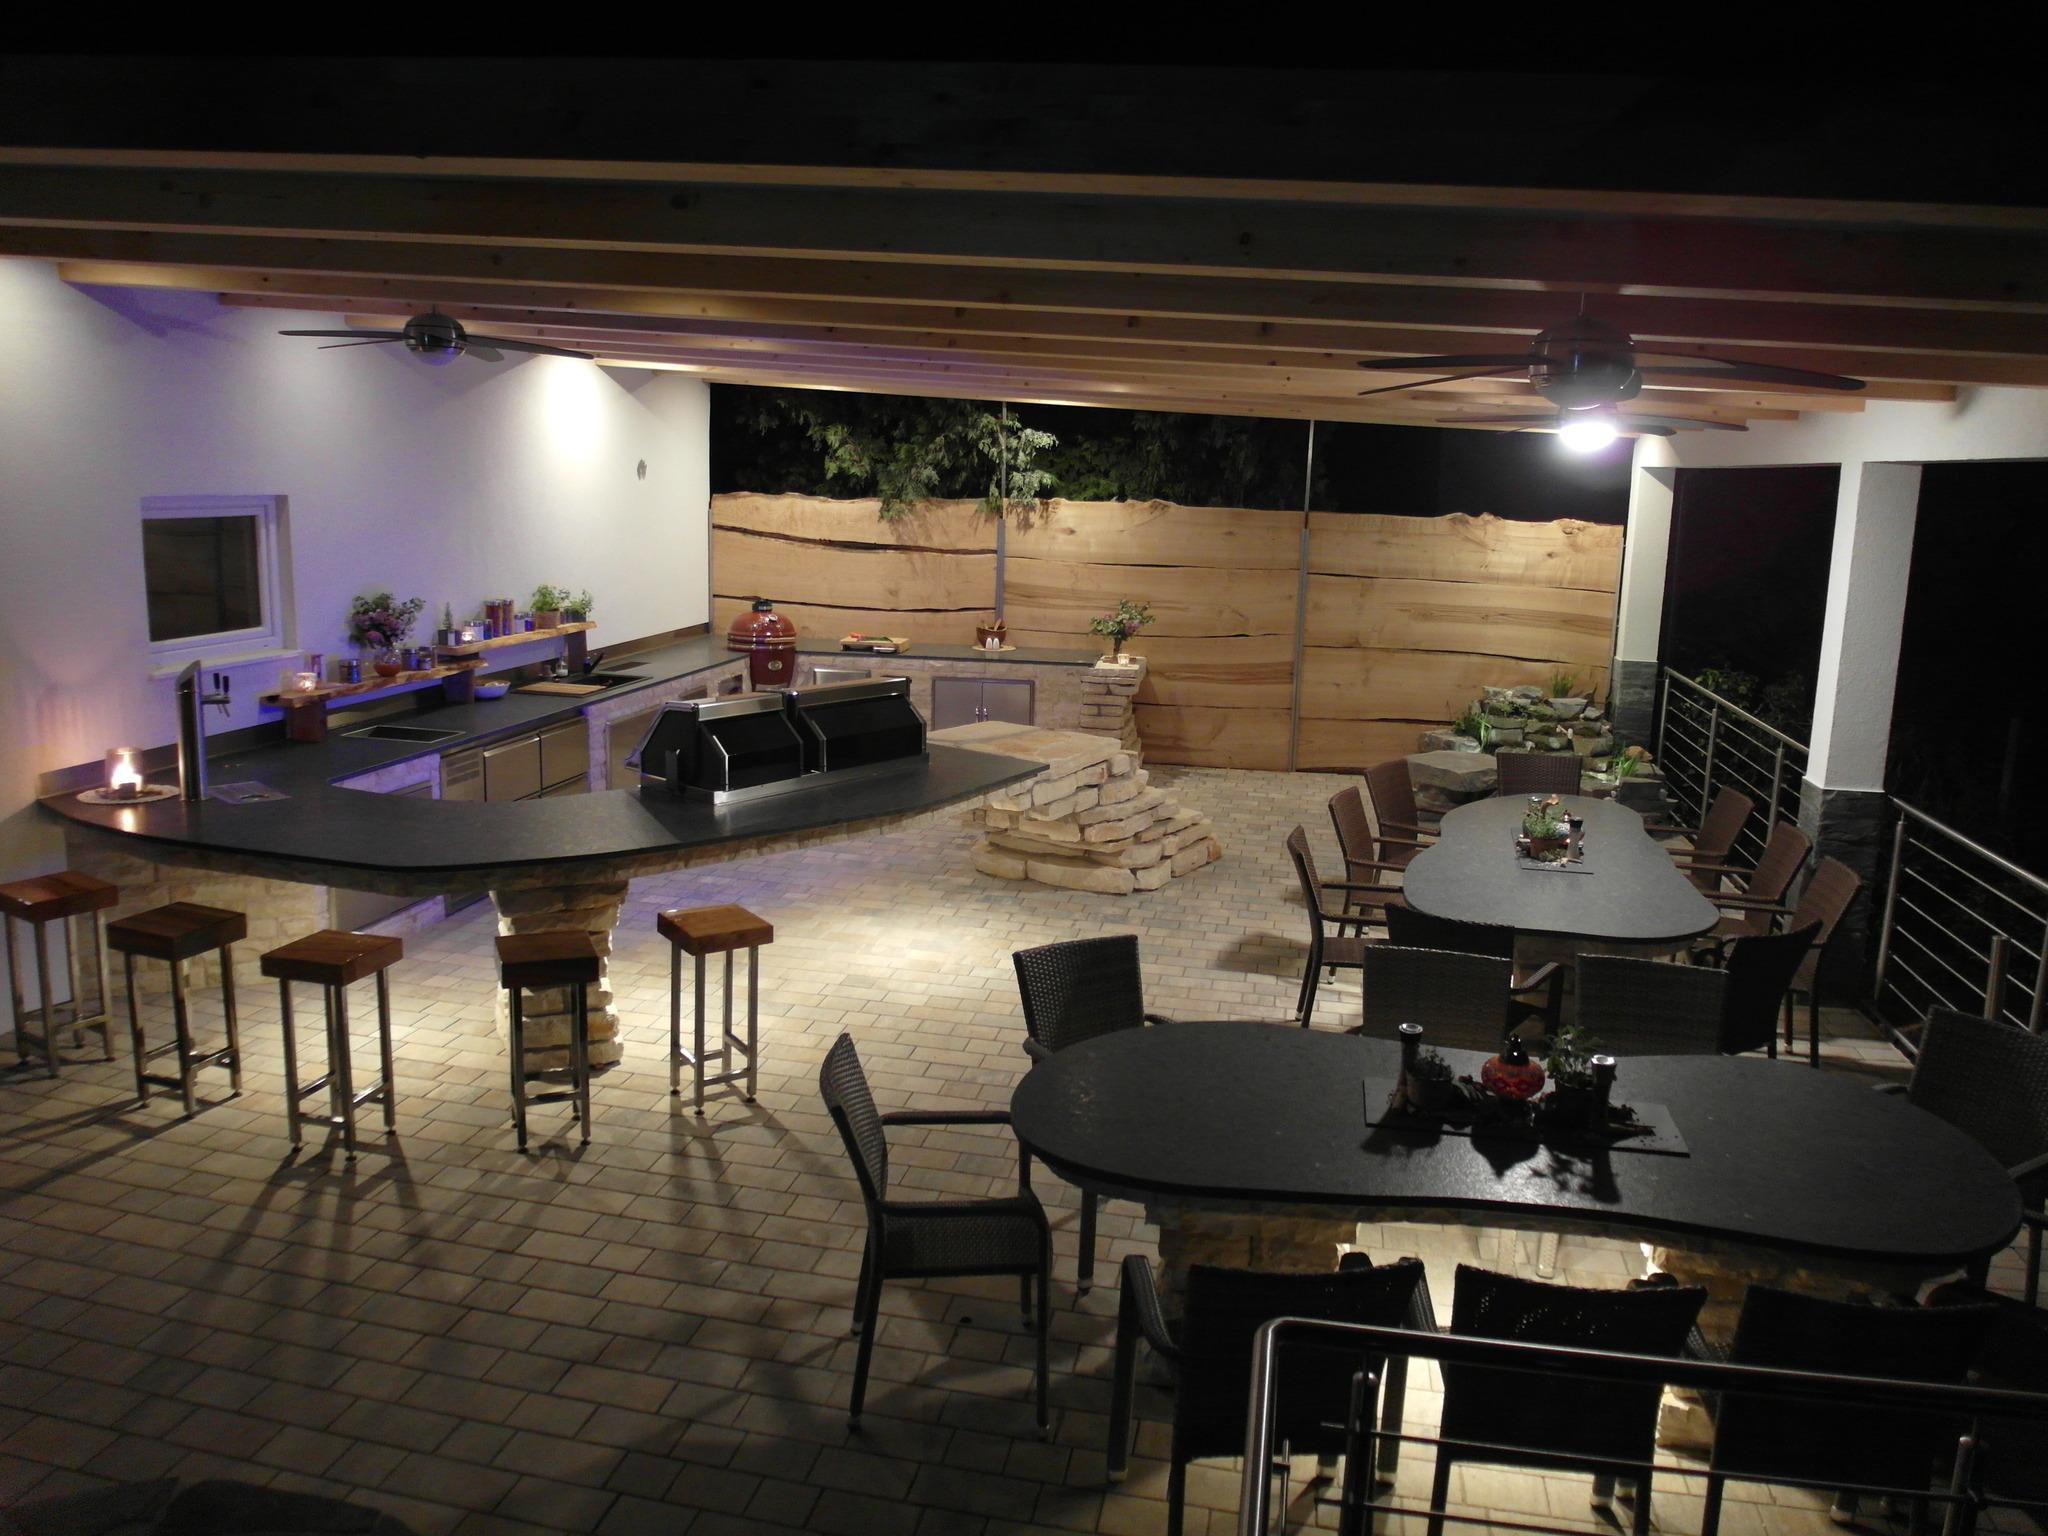 Outdoor Küchen Auersperg : Feuer flamme in draßburger outdoor küche mattersburg